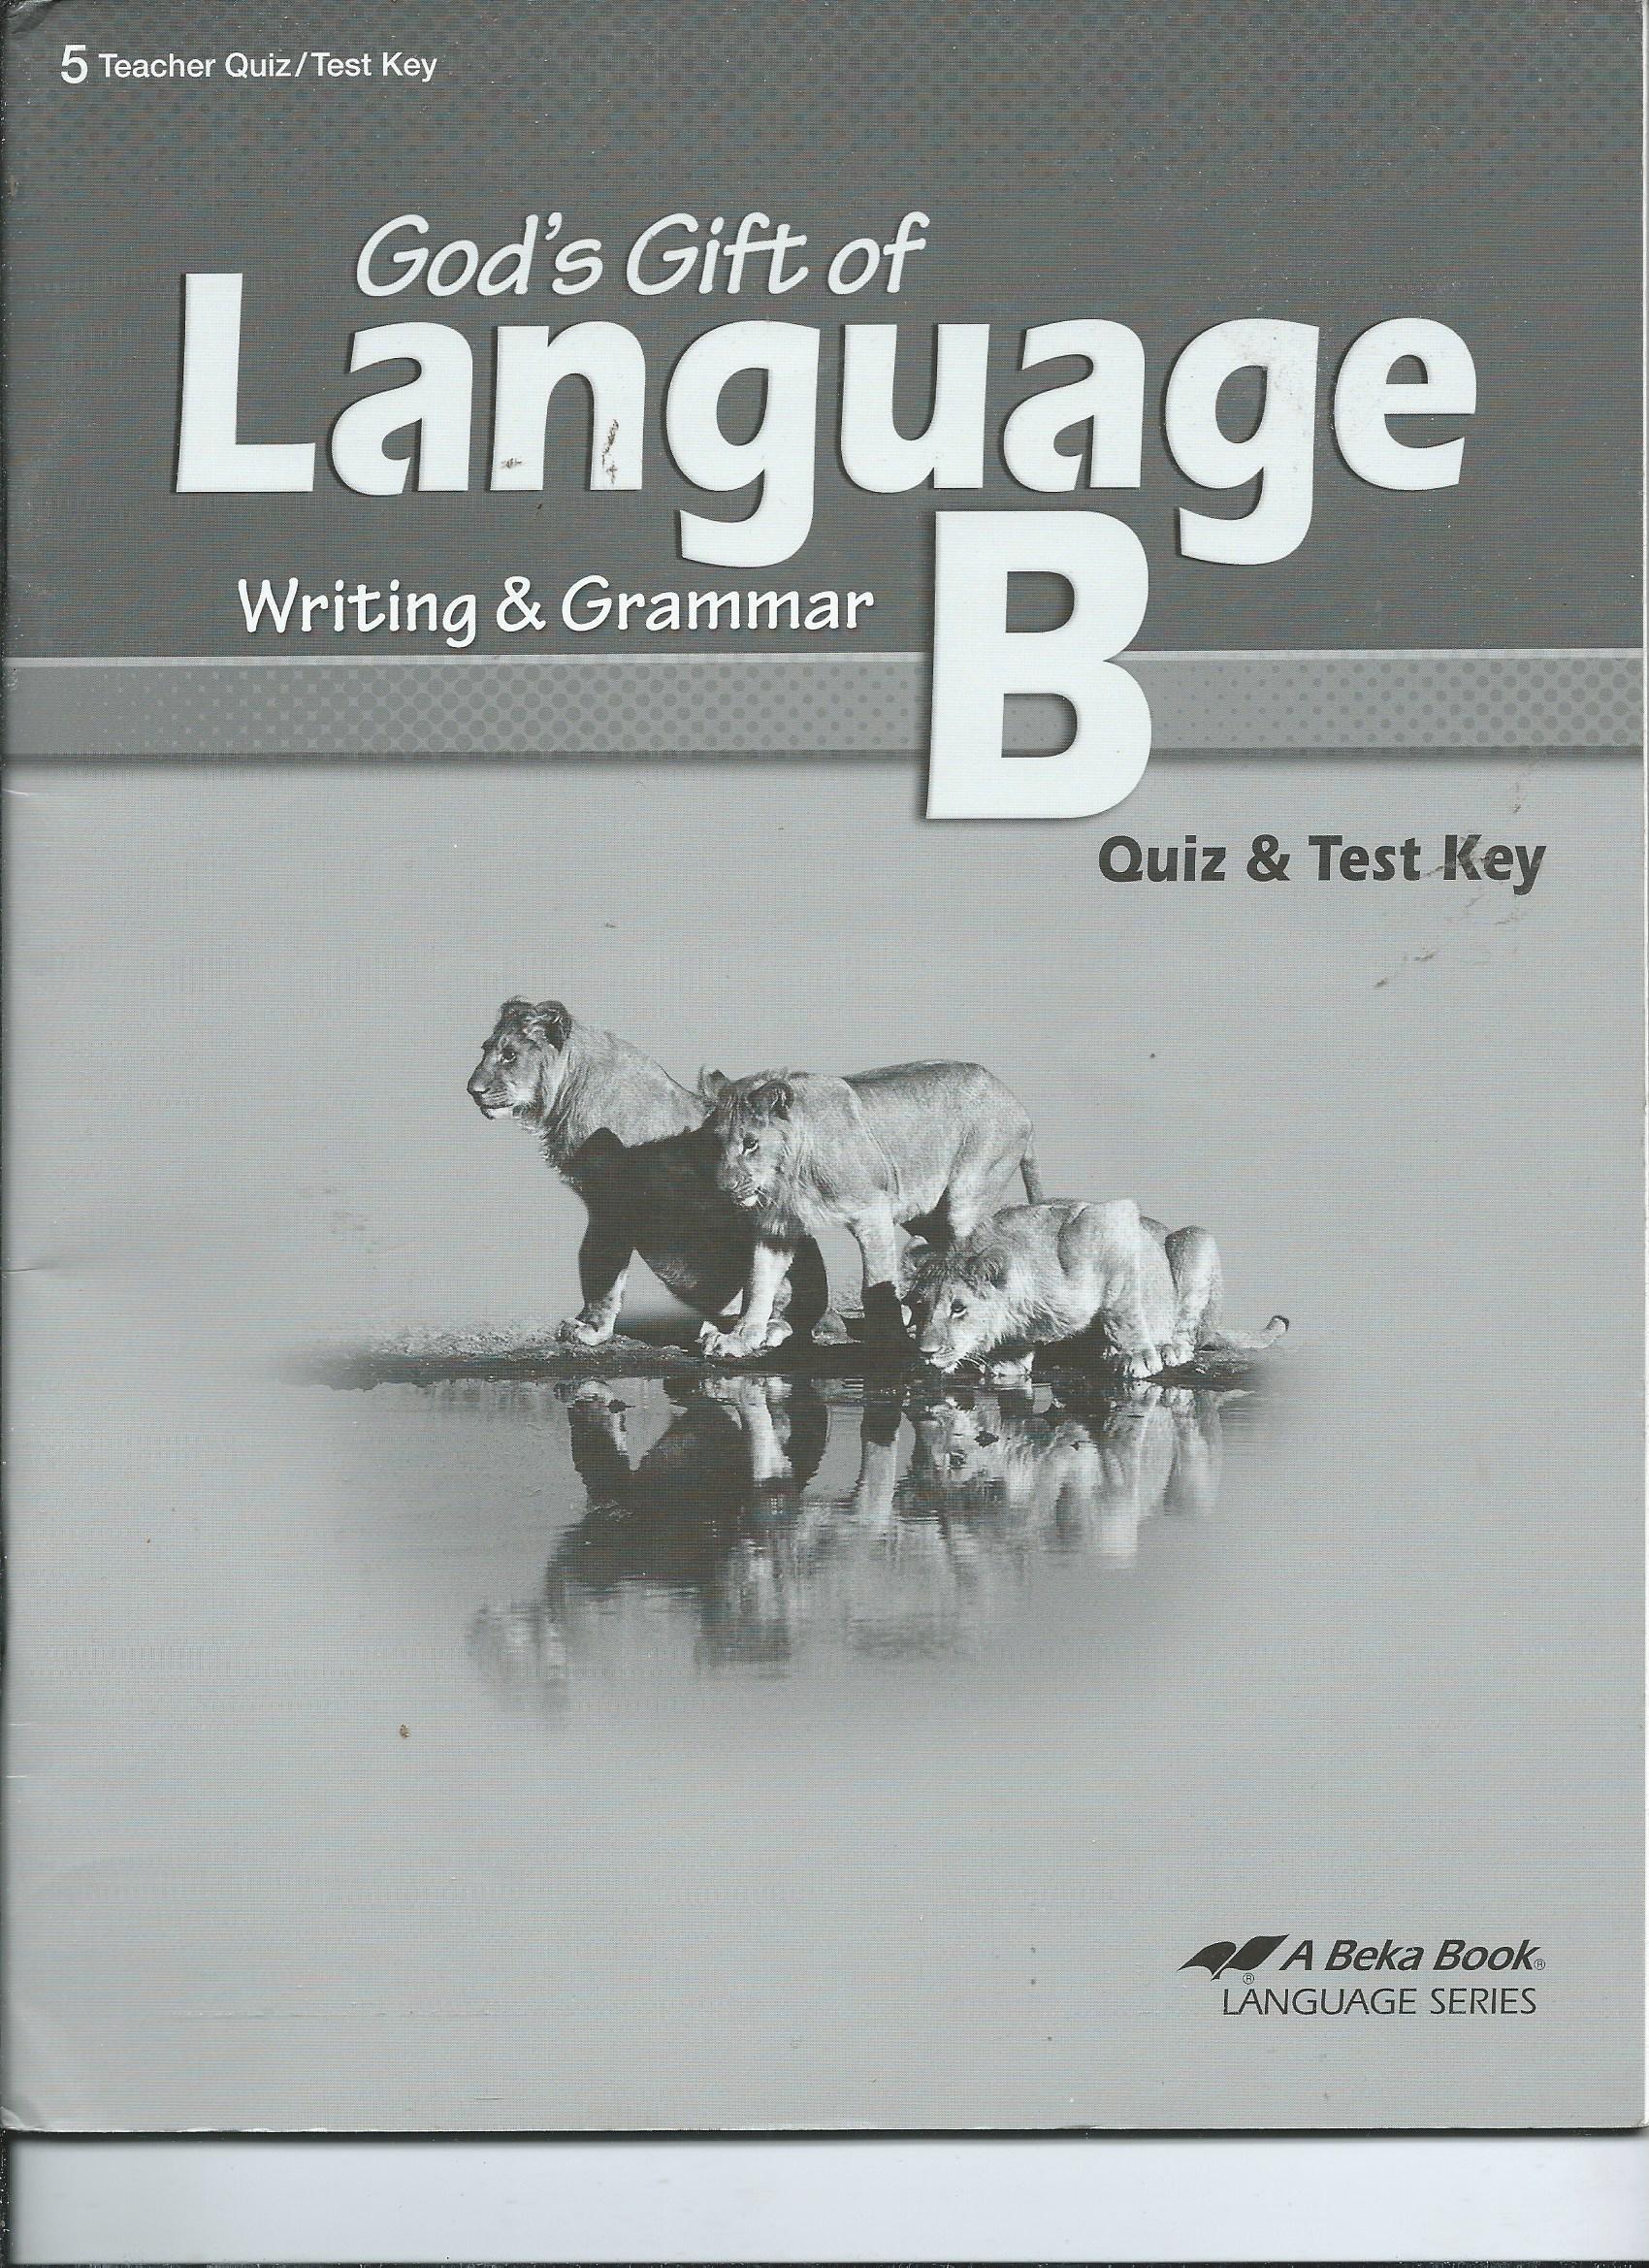 God's Gift of Language B: Writing and Grammar (quiz and test key) pdf epub